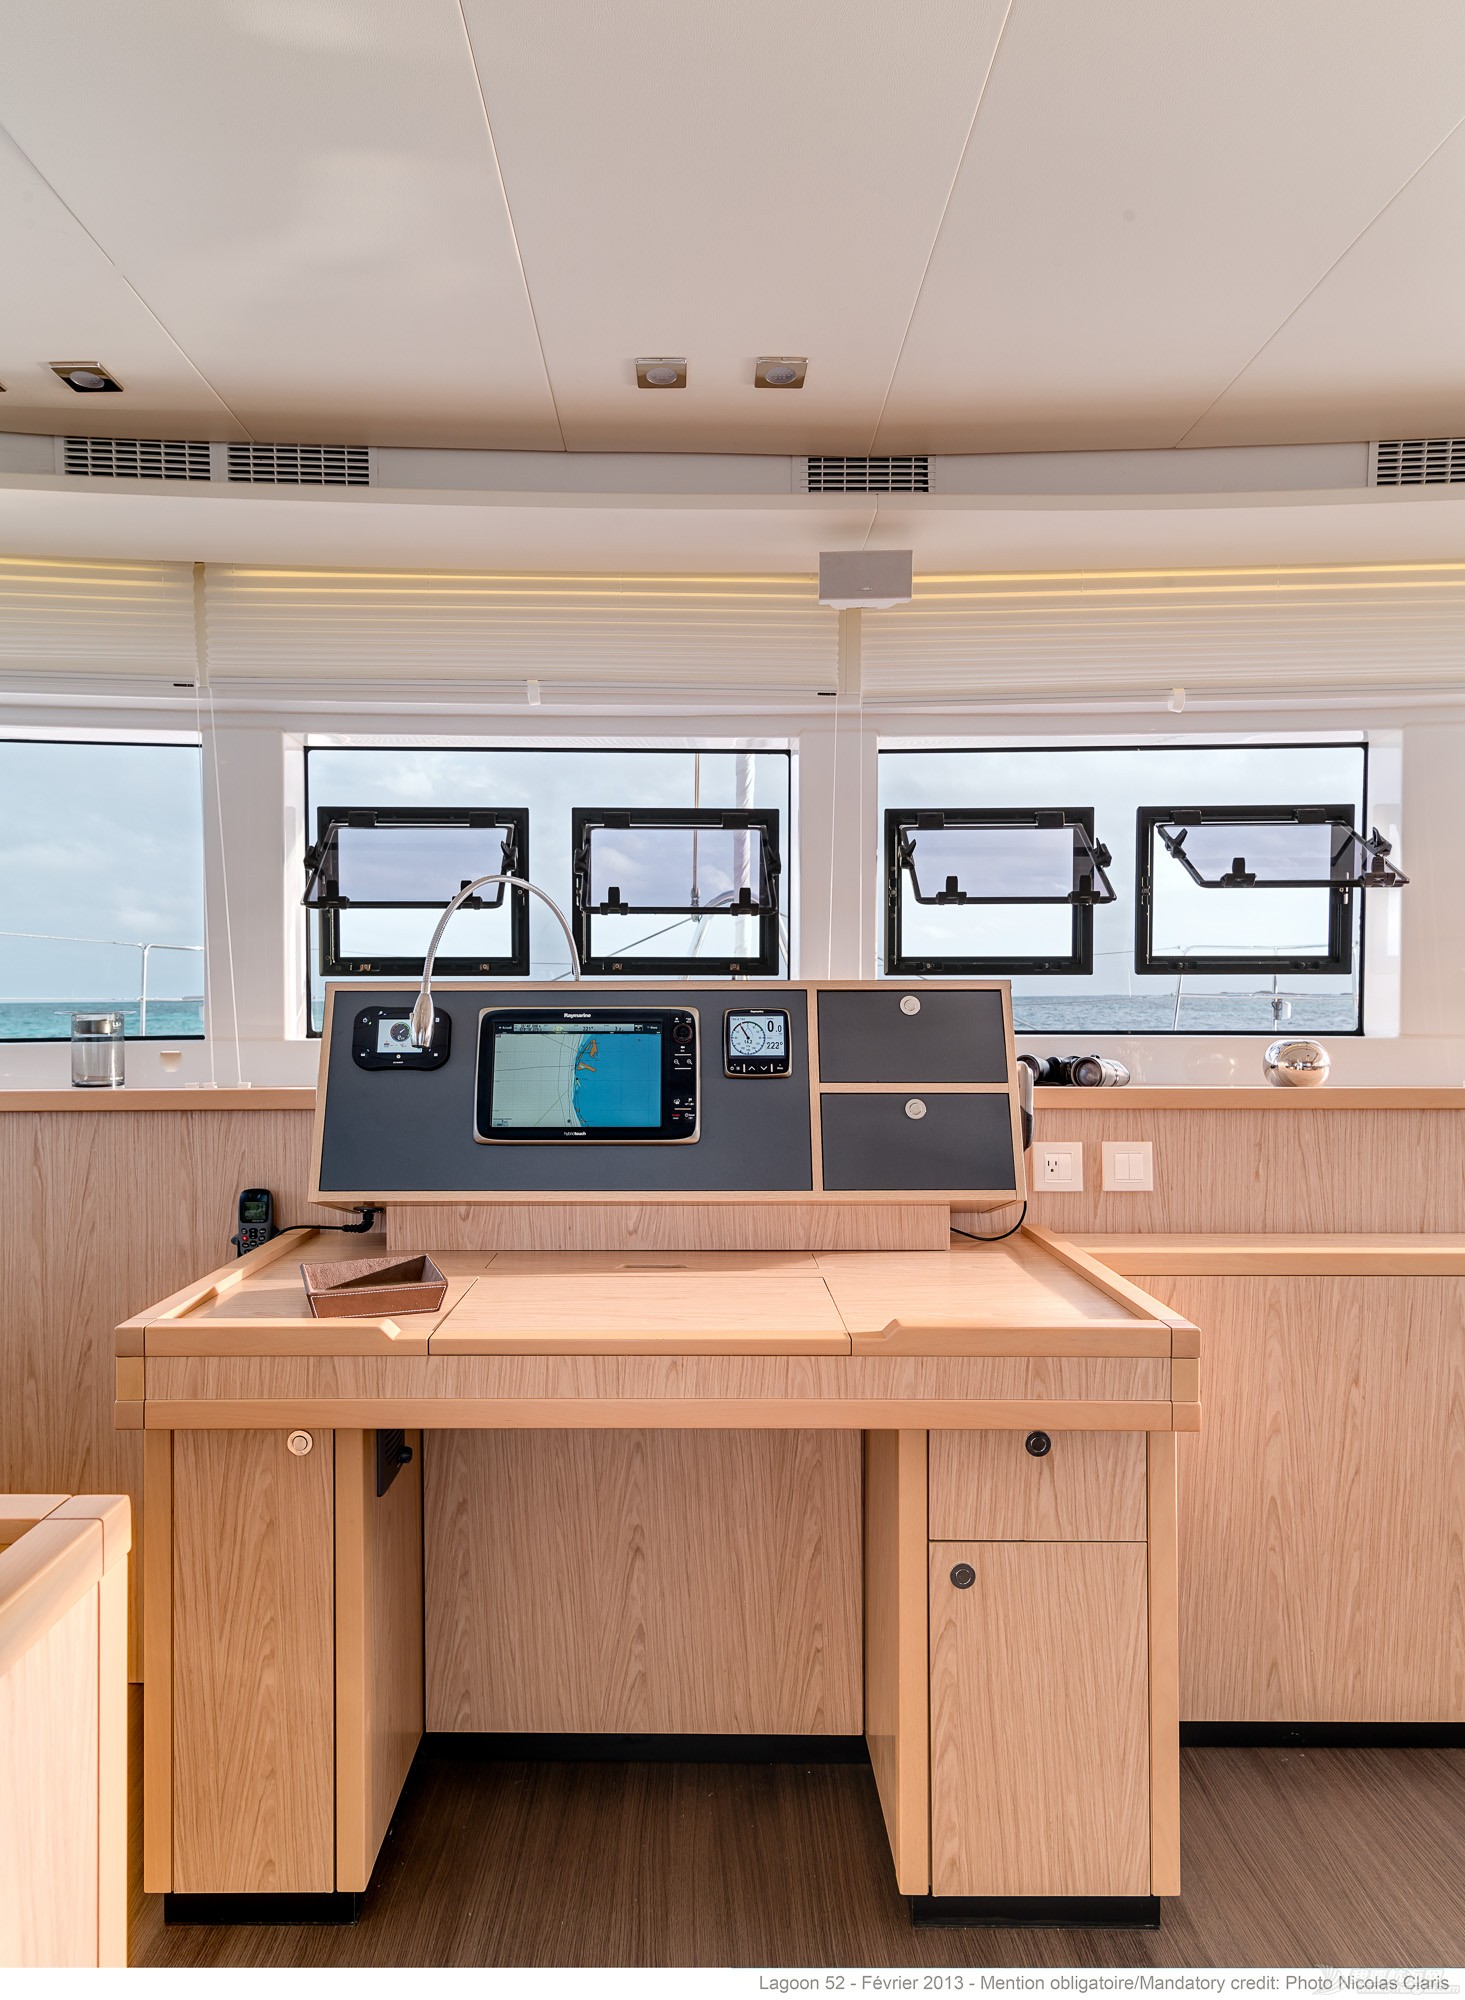 帆船 lagoon 52F 蓝高52F双体帆船 蓝高52F双体帆船